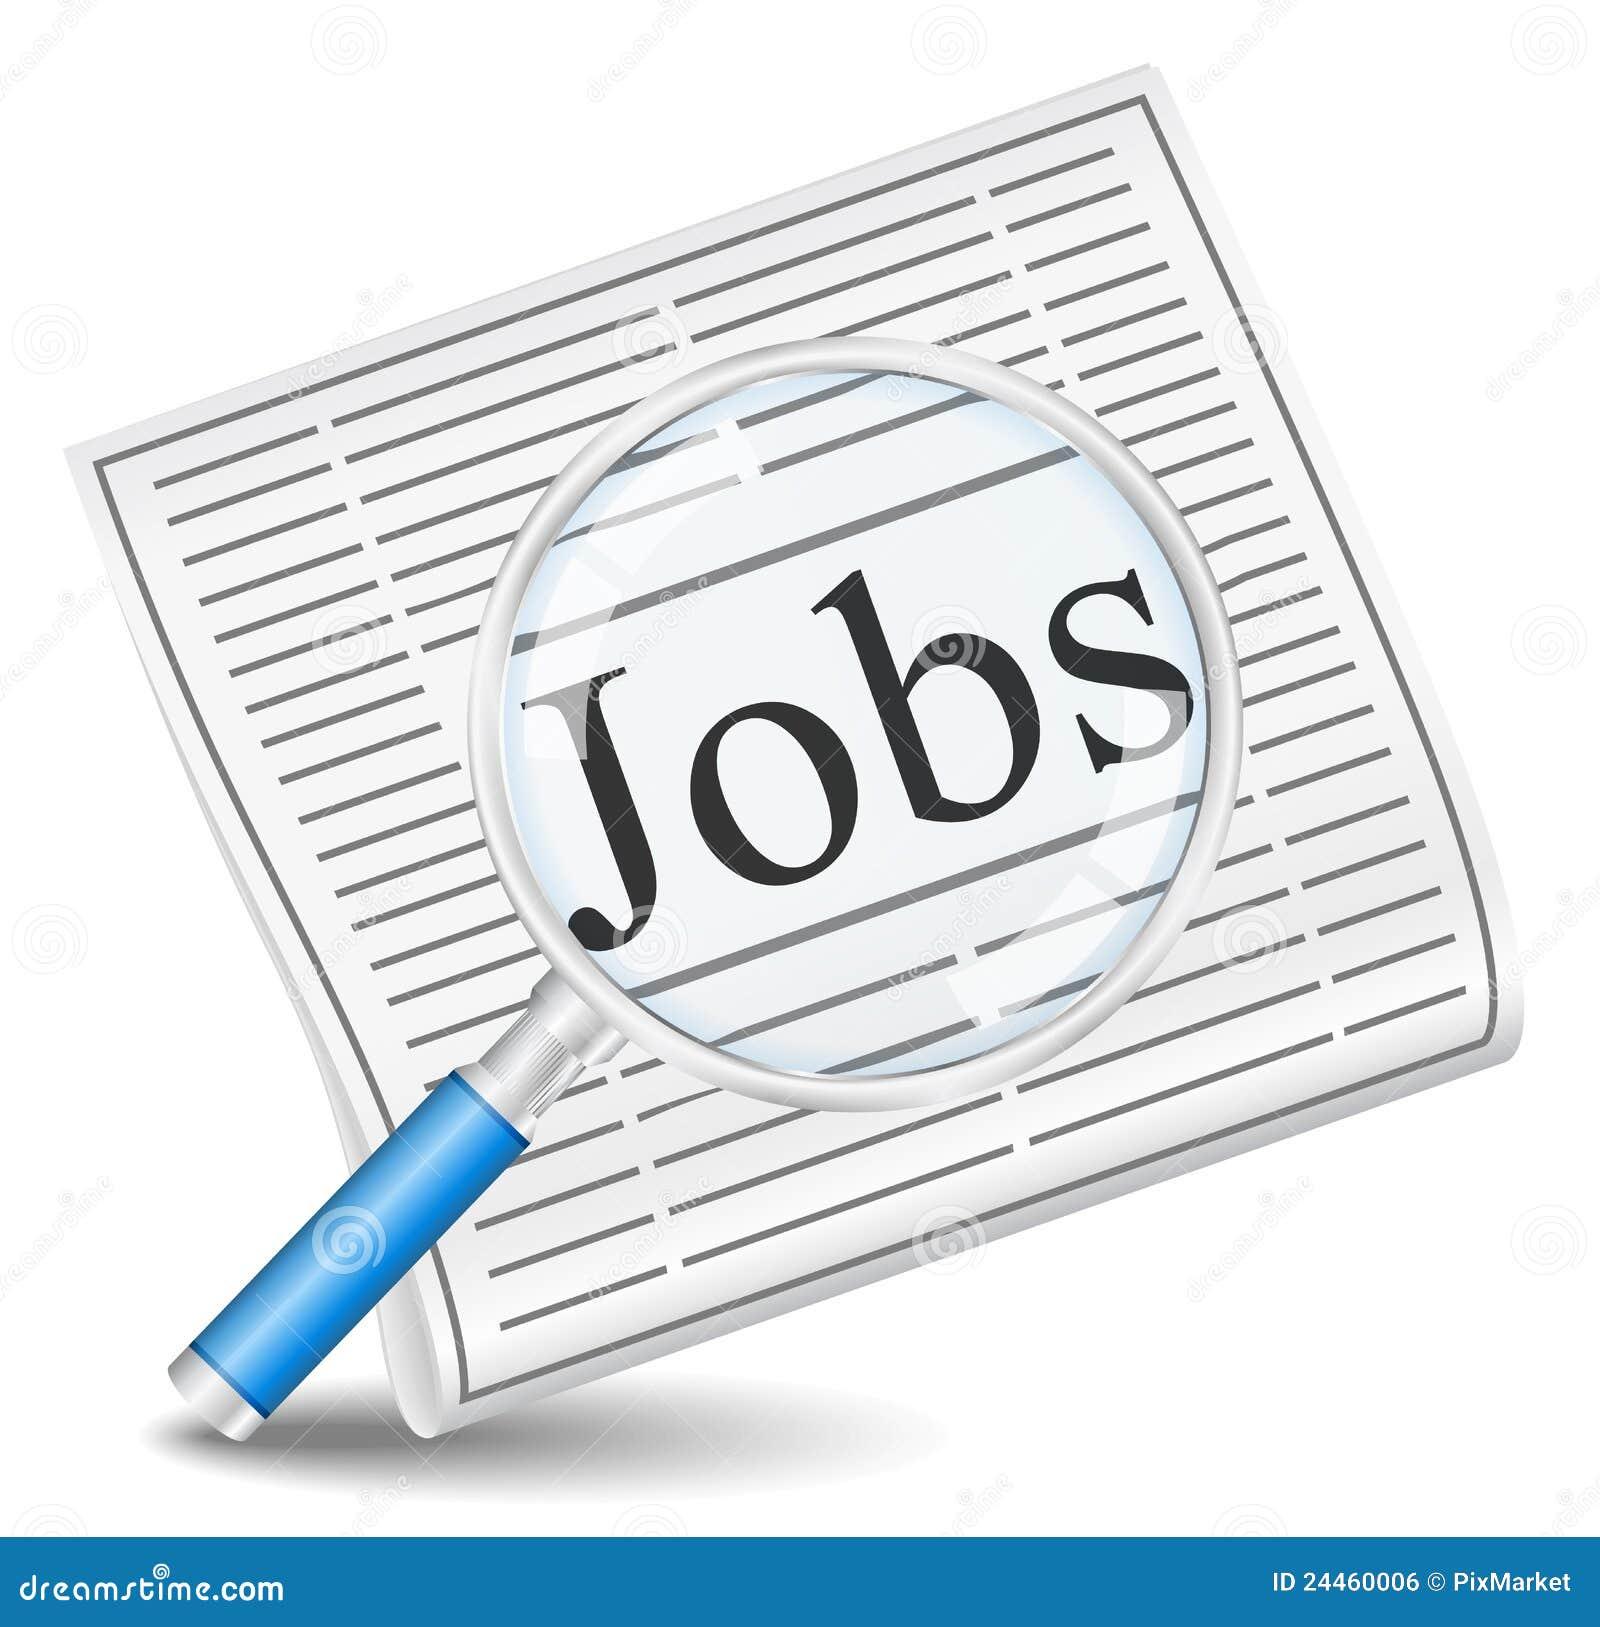 Job Search Concept